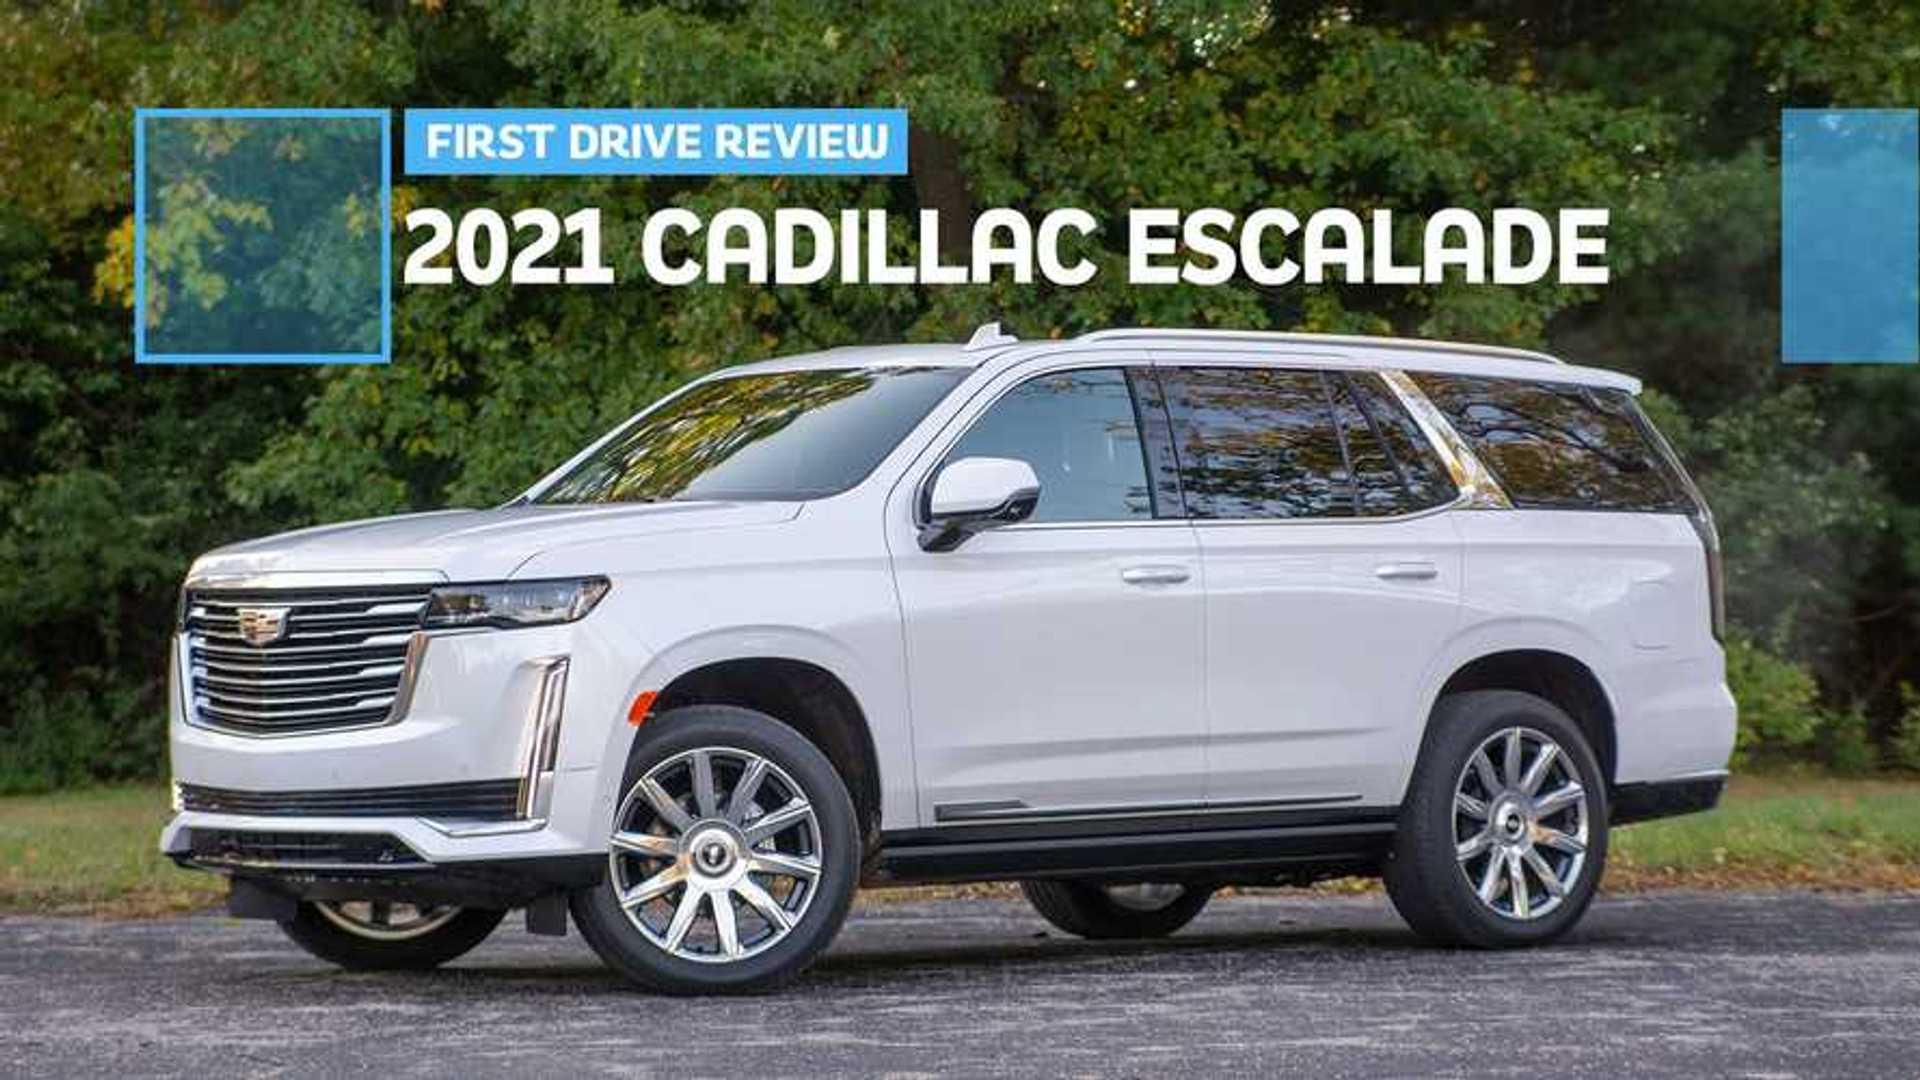 2021 Cadillac Escalade First Drive Review: The Cadillac Of Cadillacs